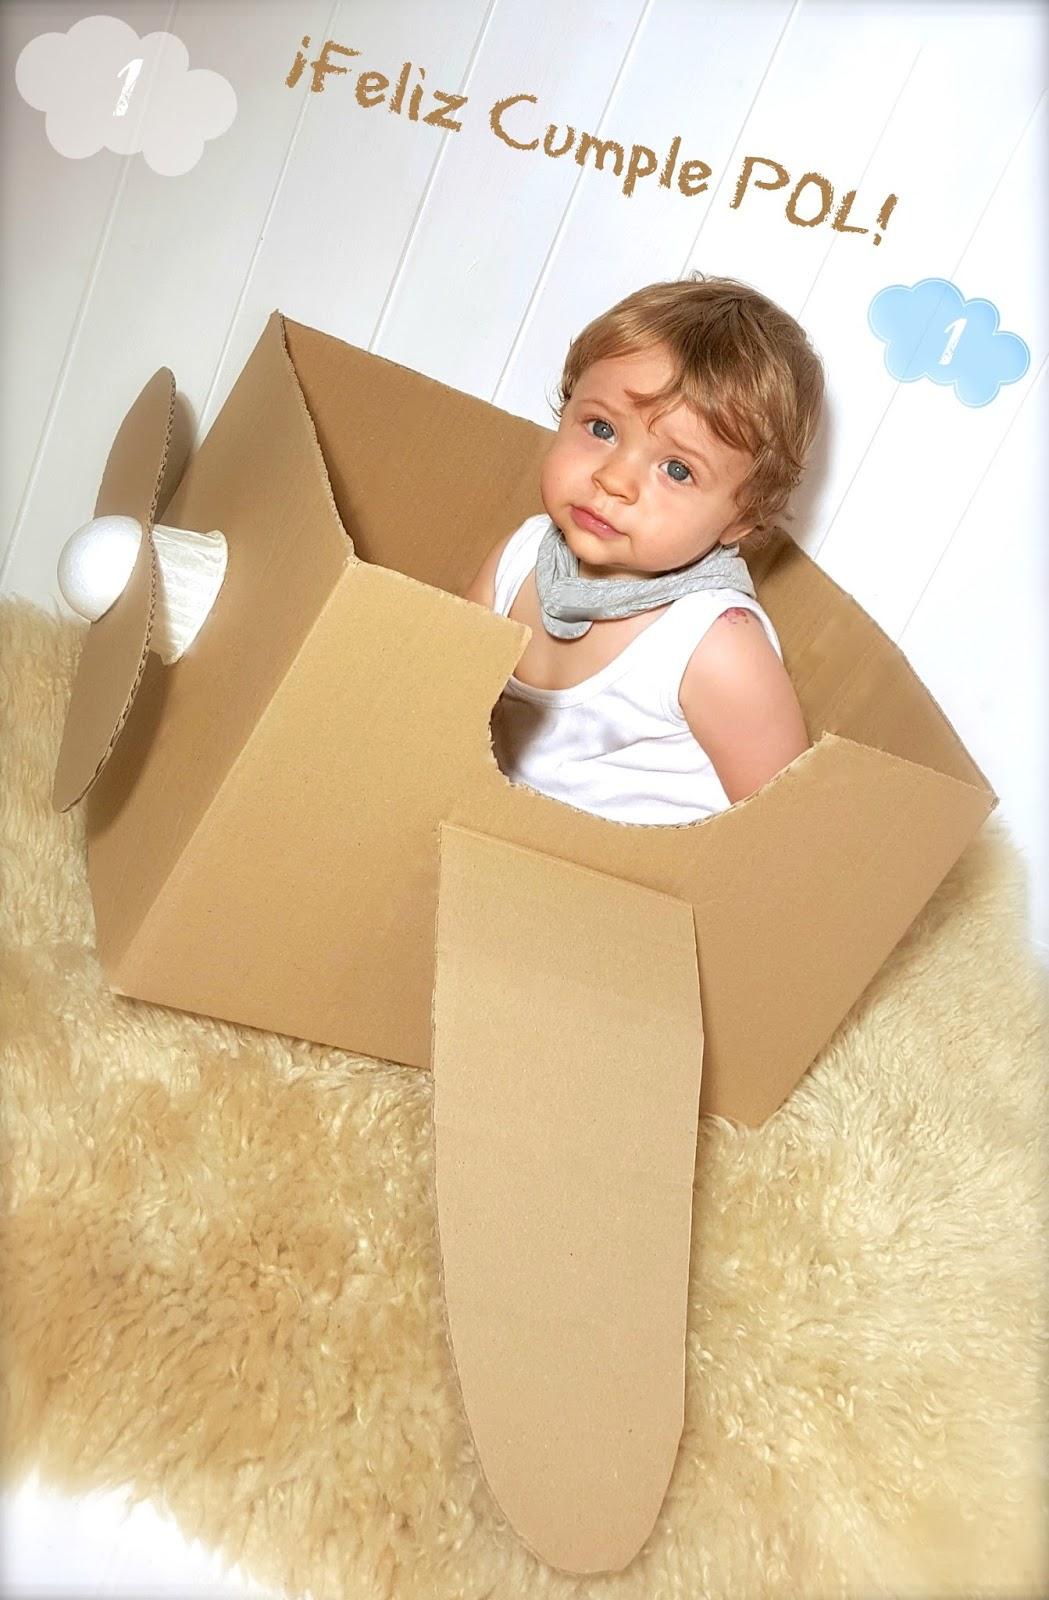 casa caja carton bueno aire: